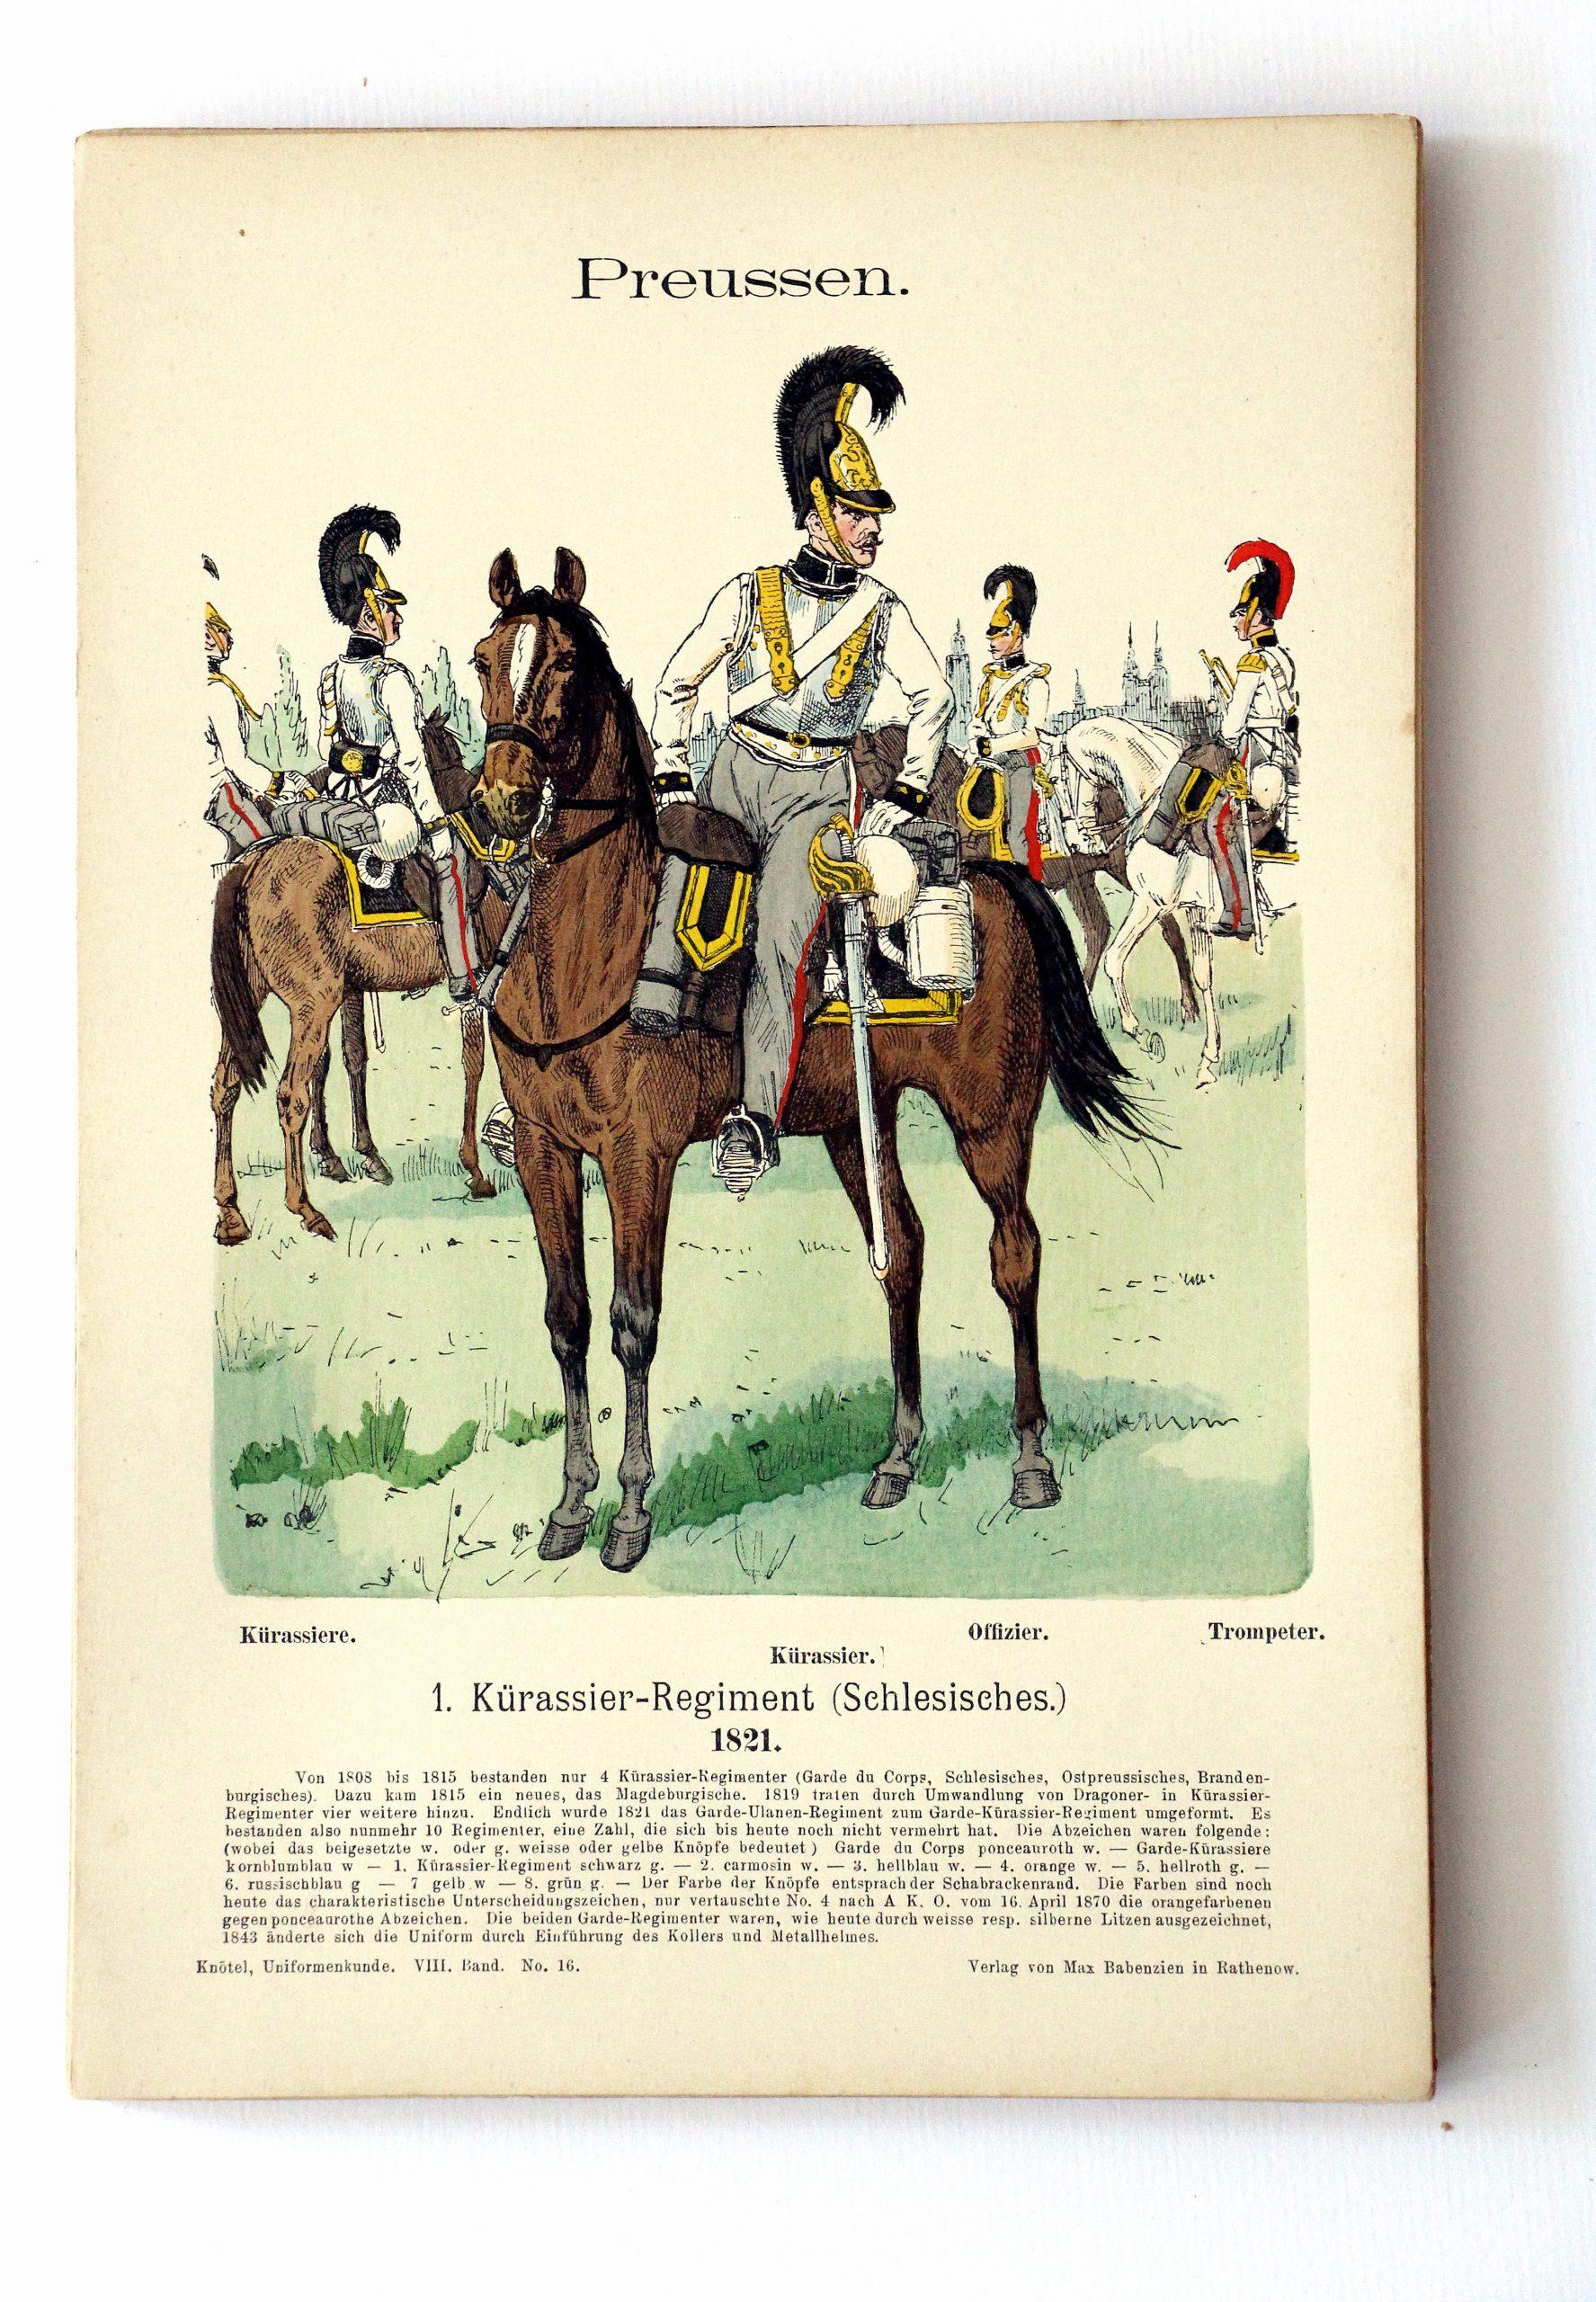 Preussen - Uniformenkunde - Richard Knoetel - VIII - Planche 16